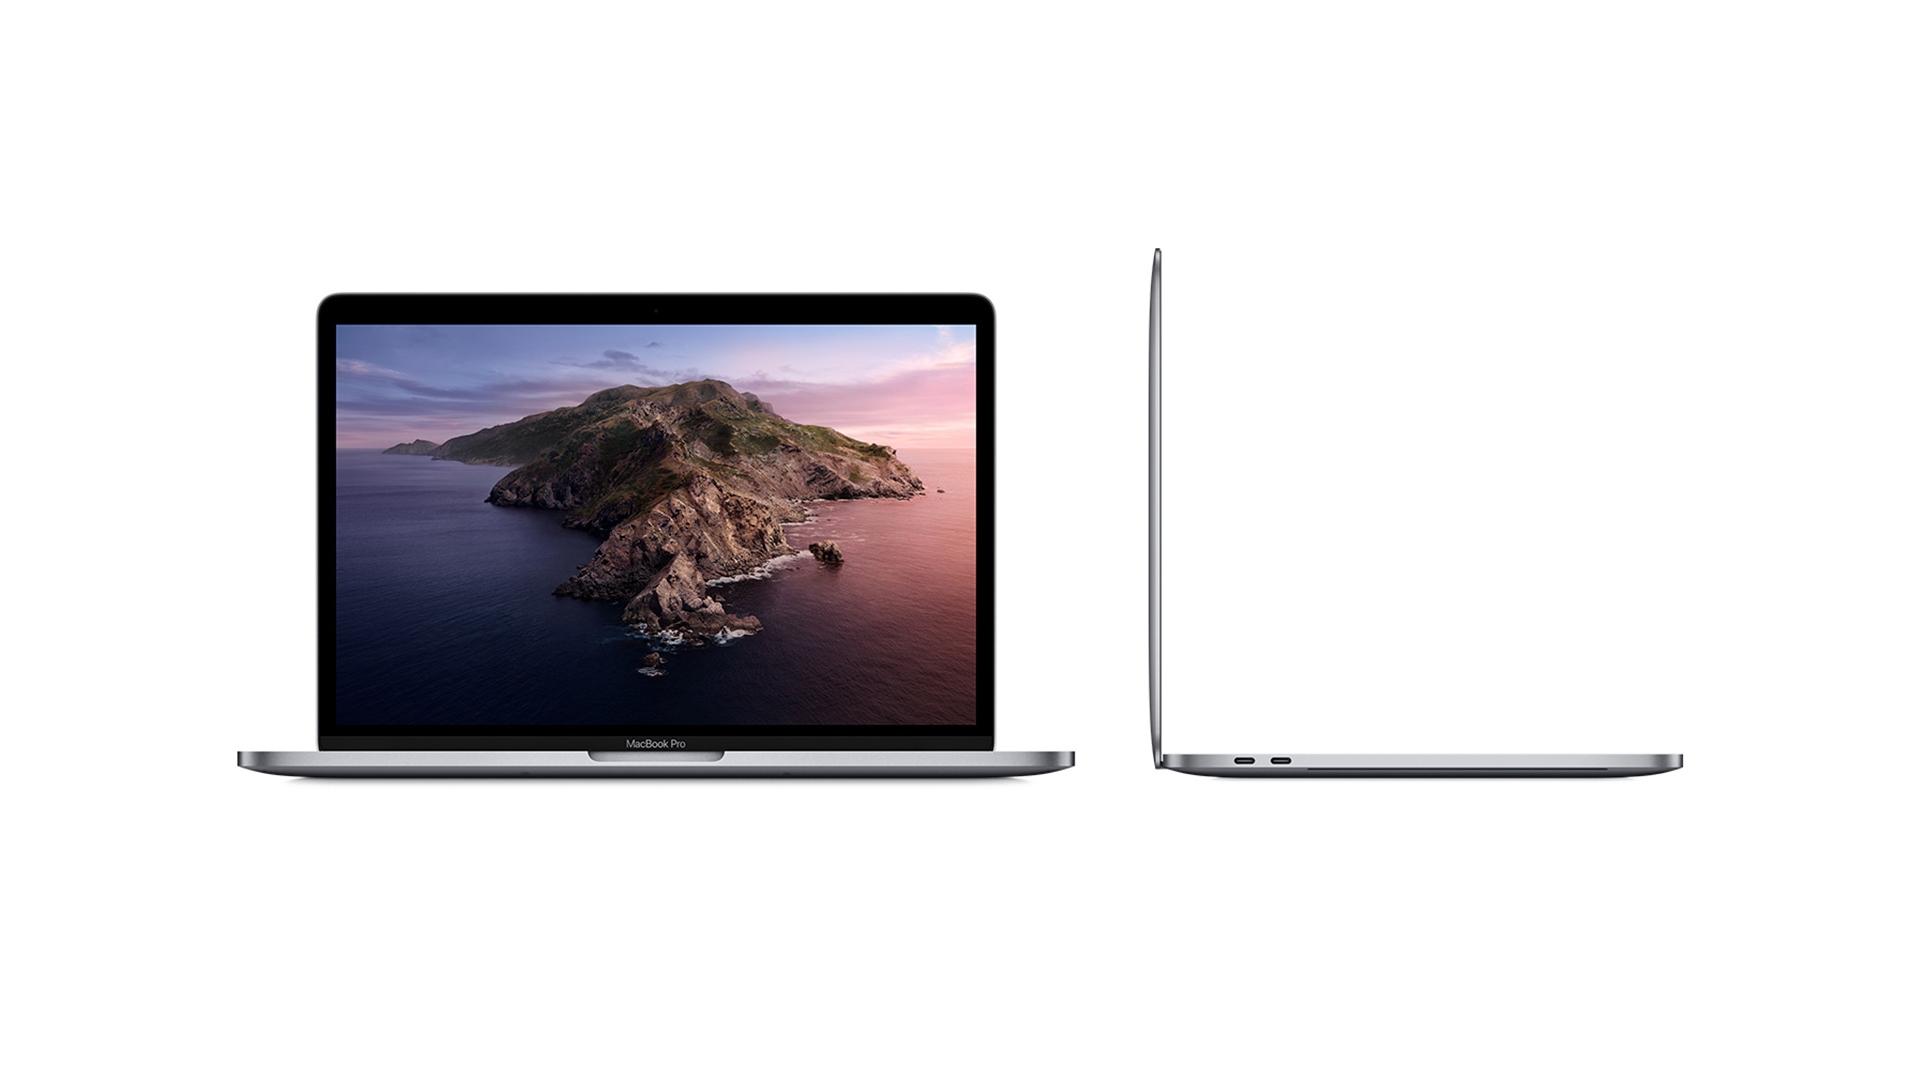 Entradas do Macbook Pro 13